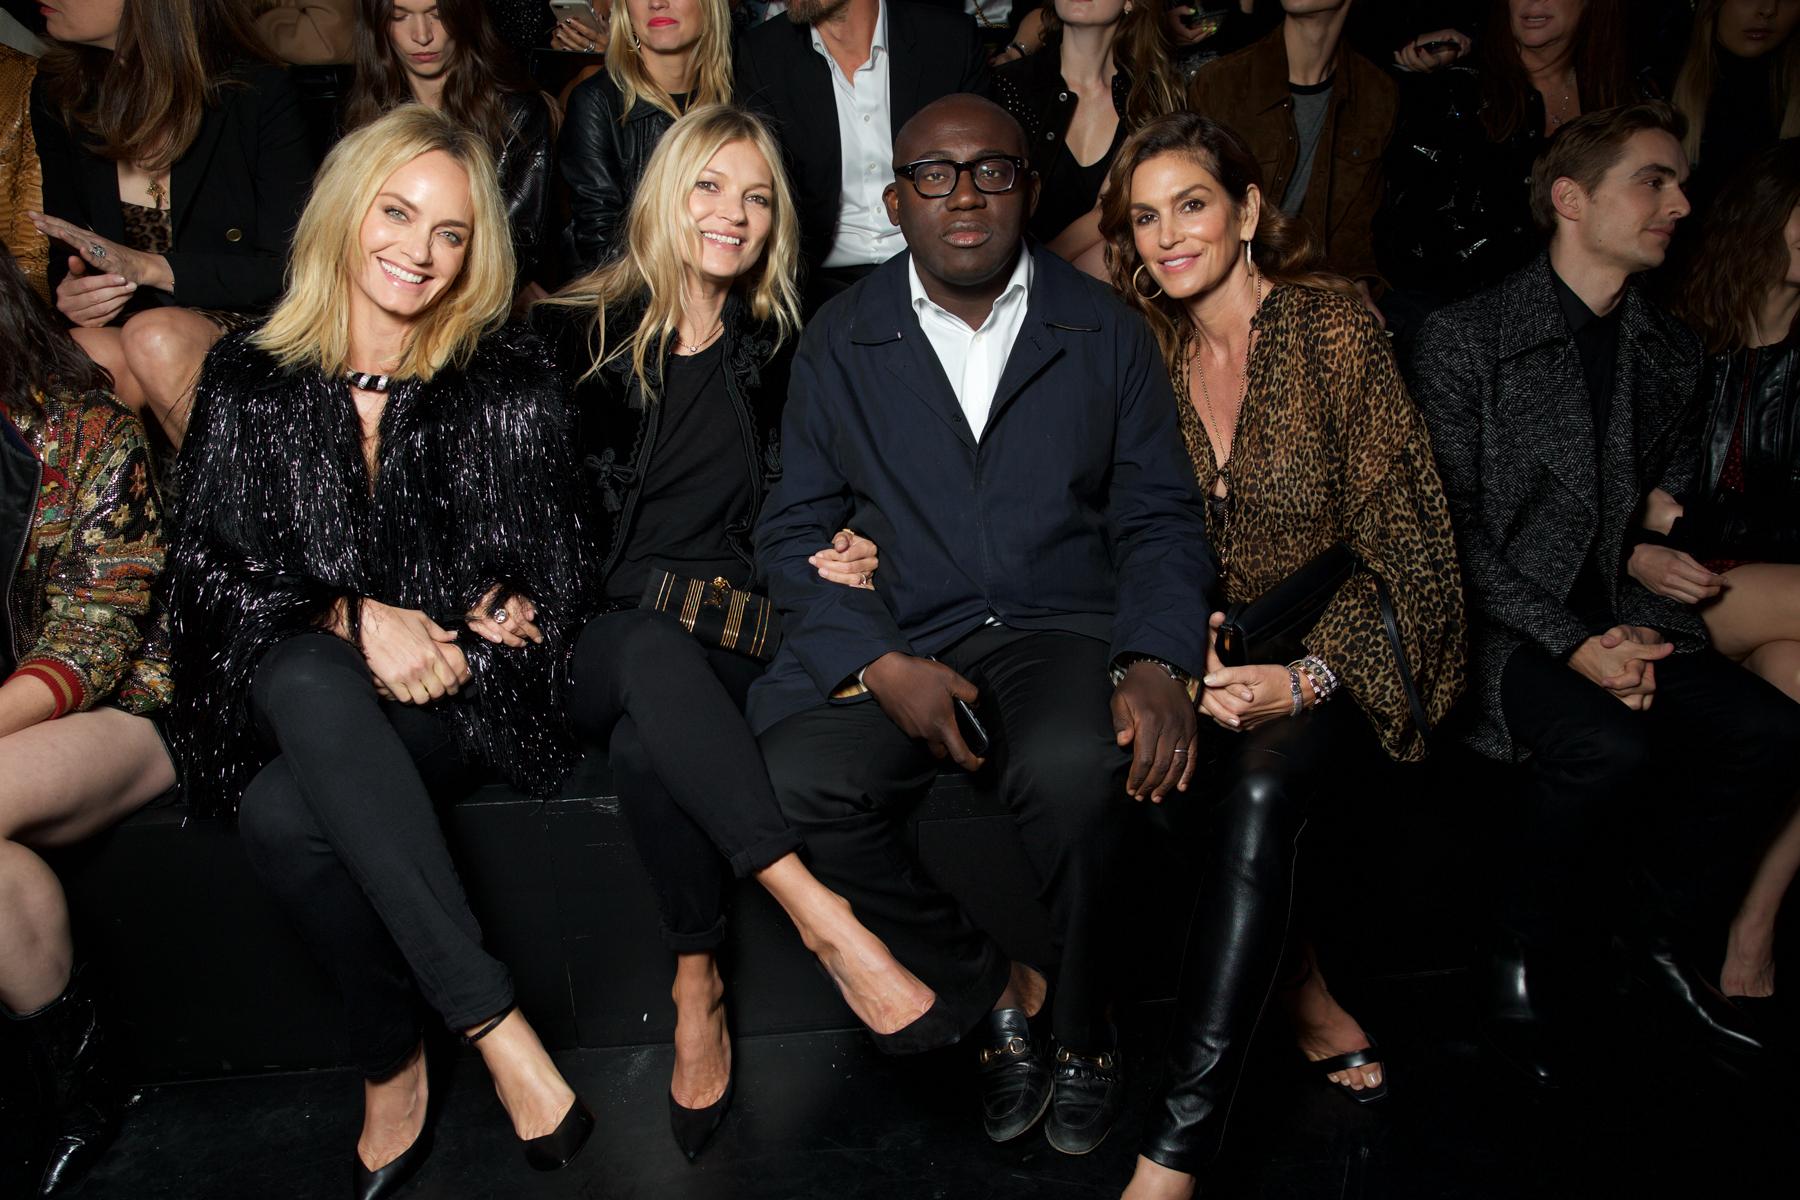 sao quốc tế tại tuần lễ thời trang paris 2019 5